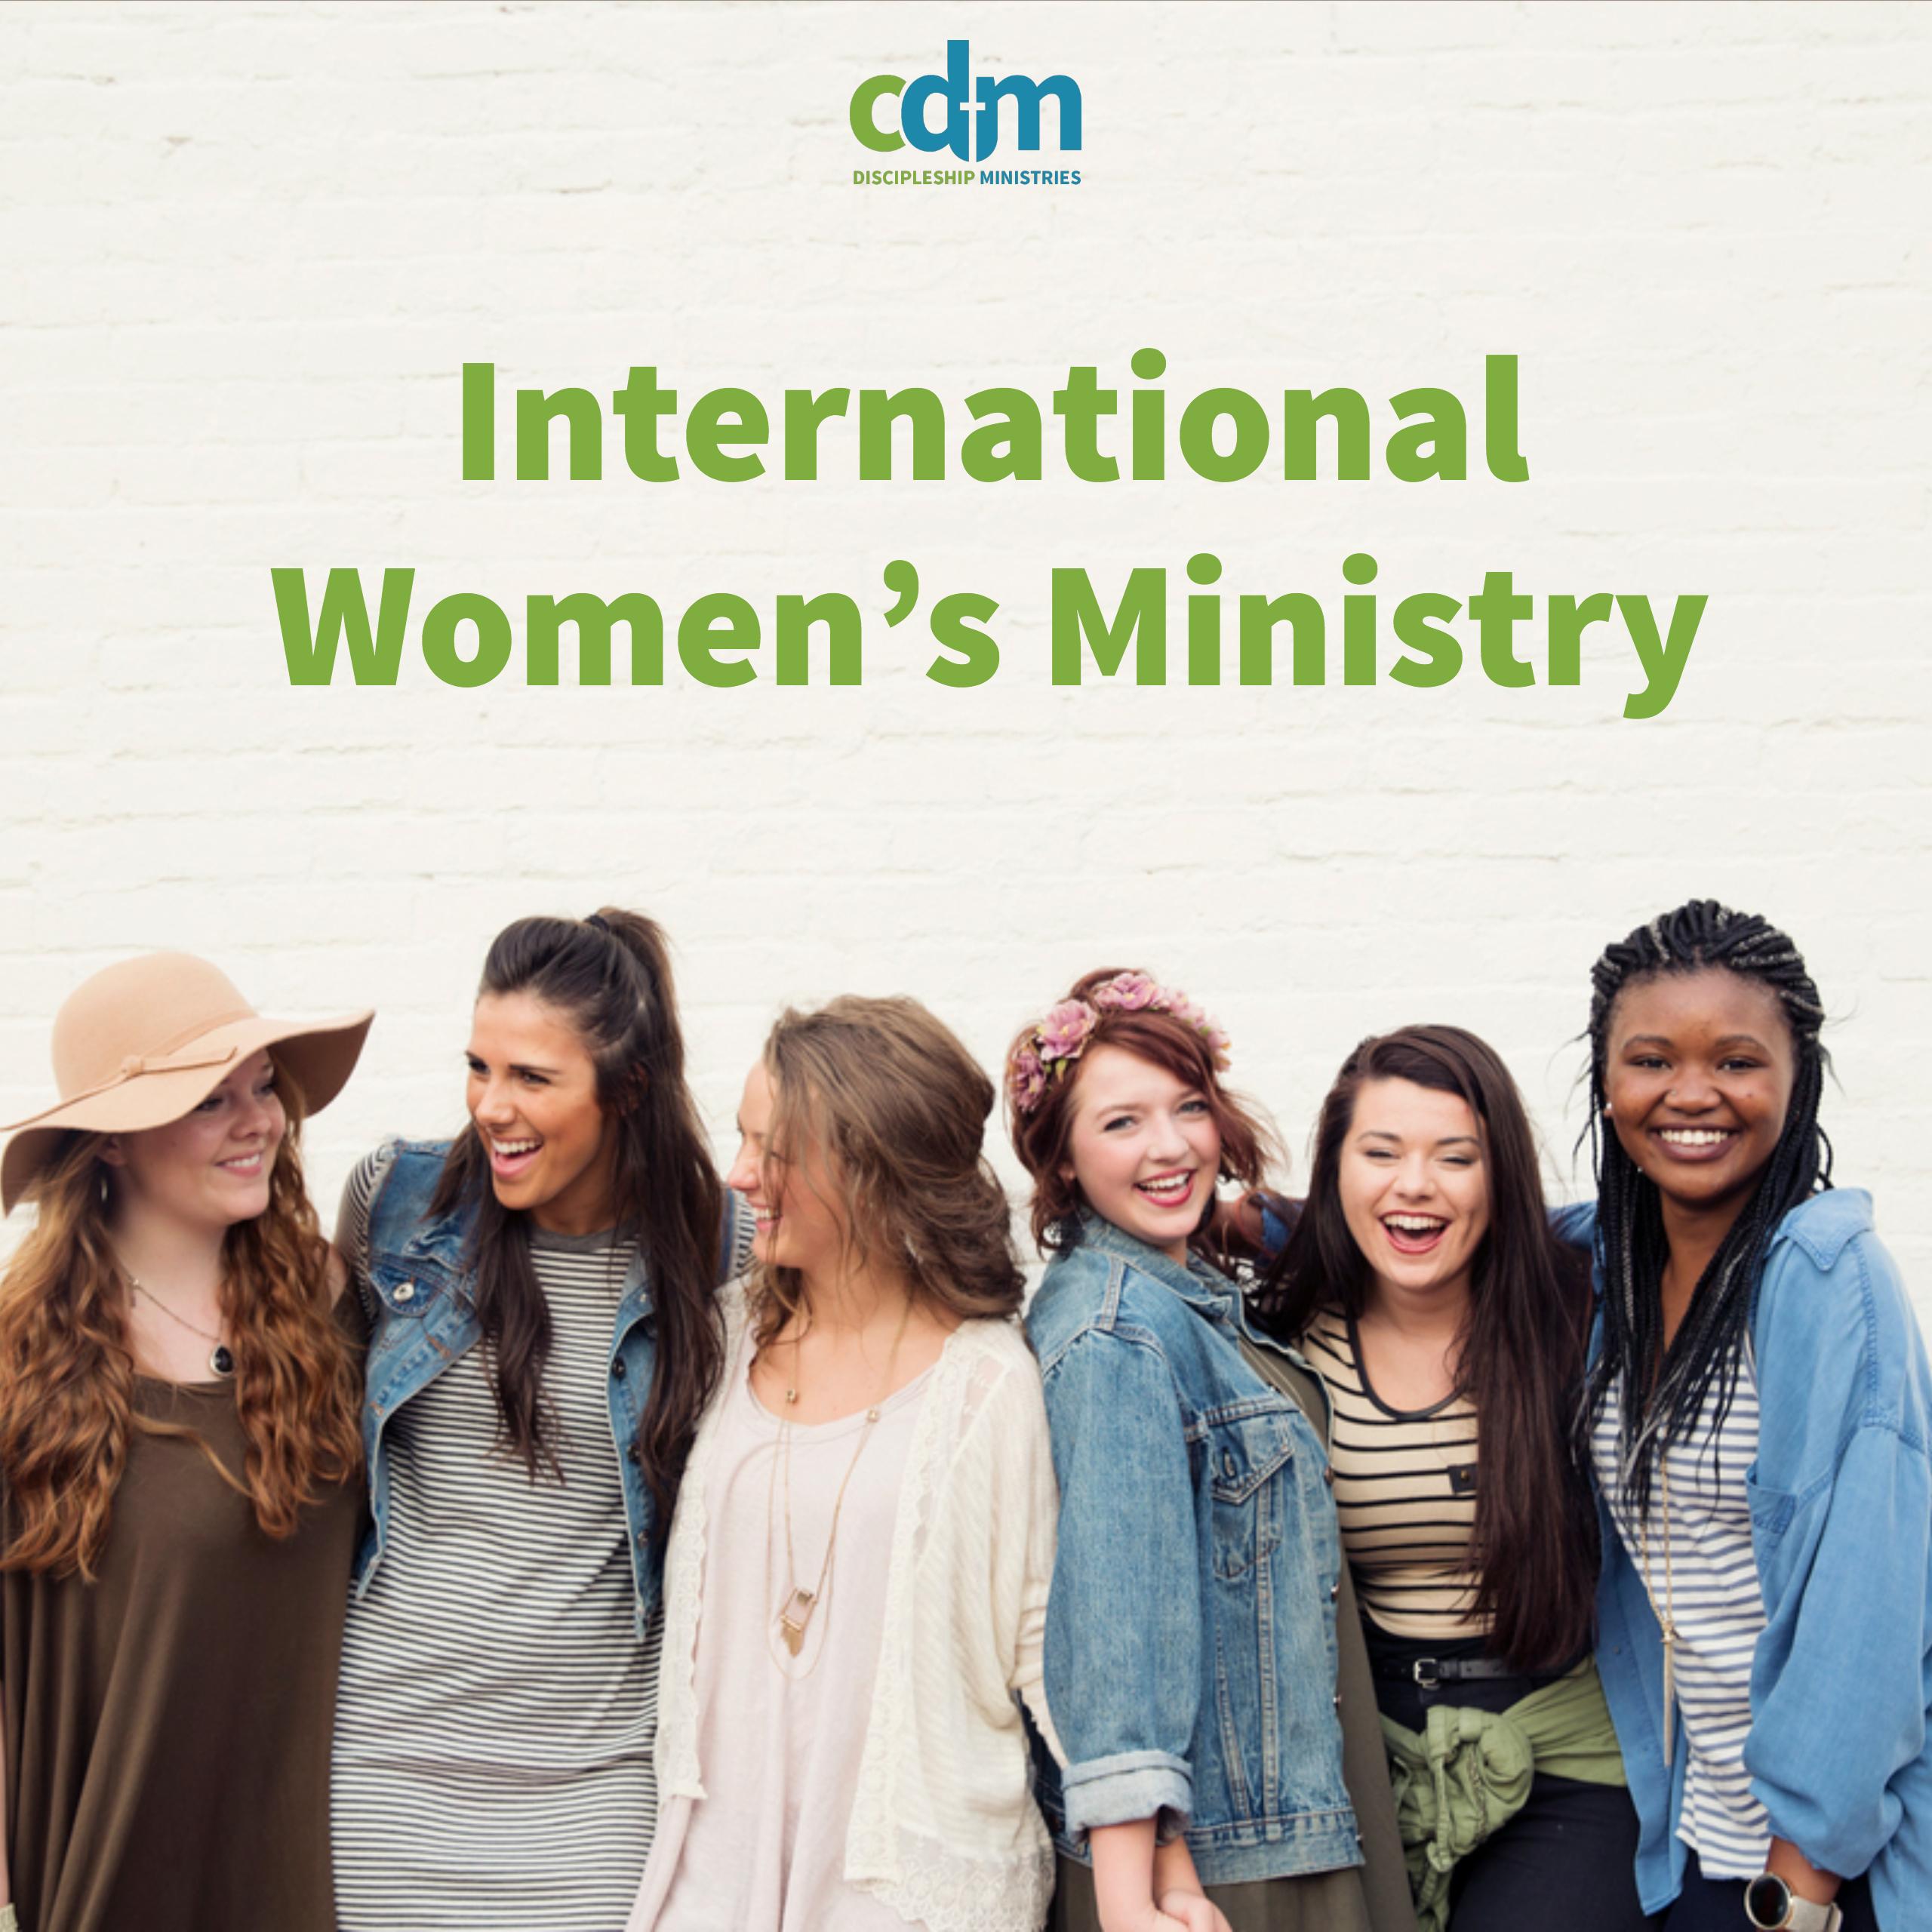 Intl womens ministry